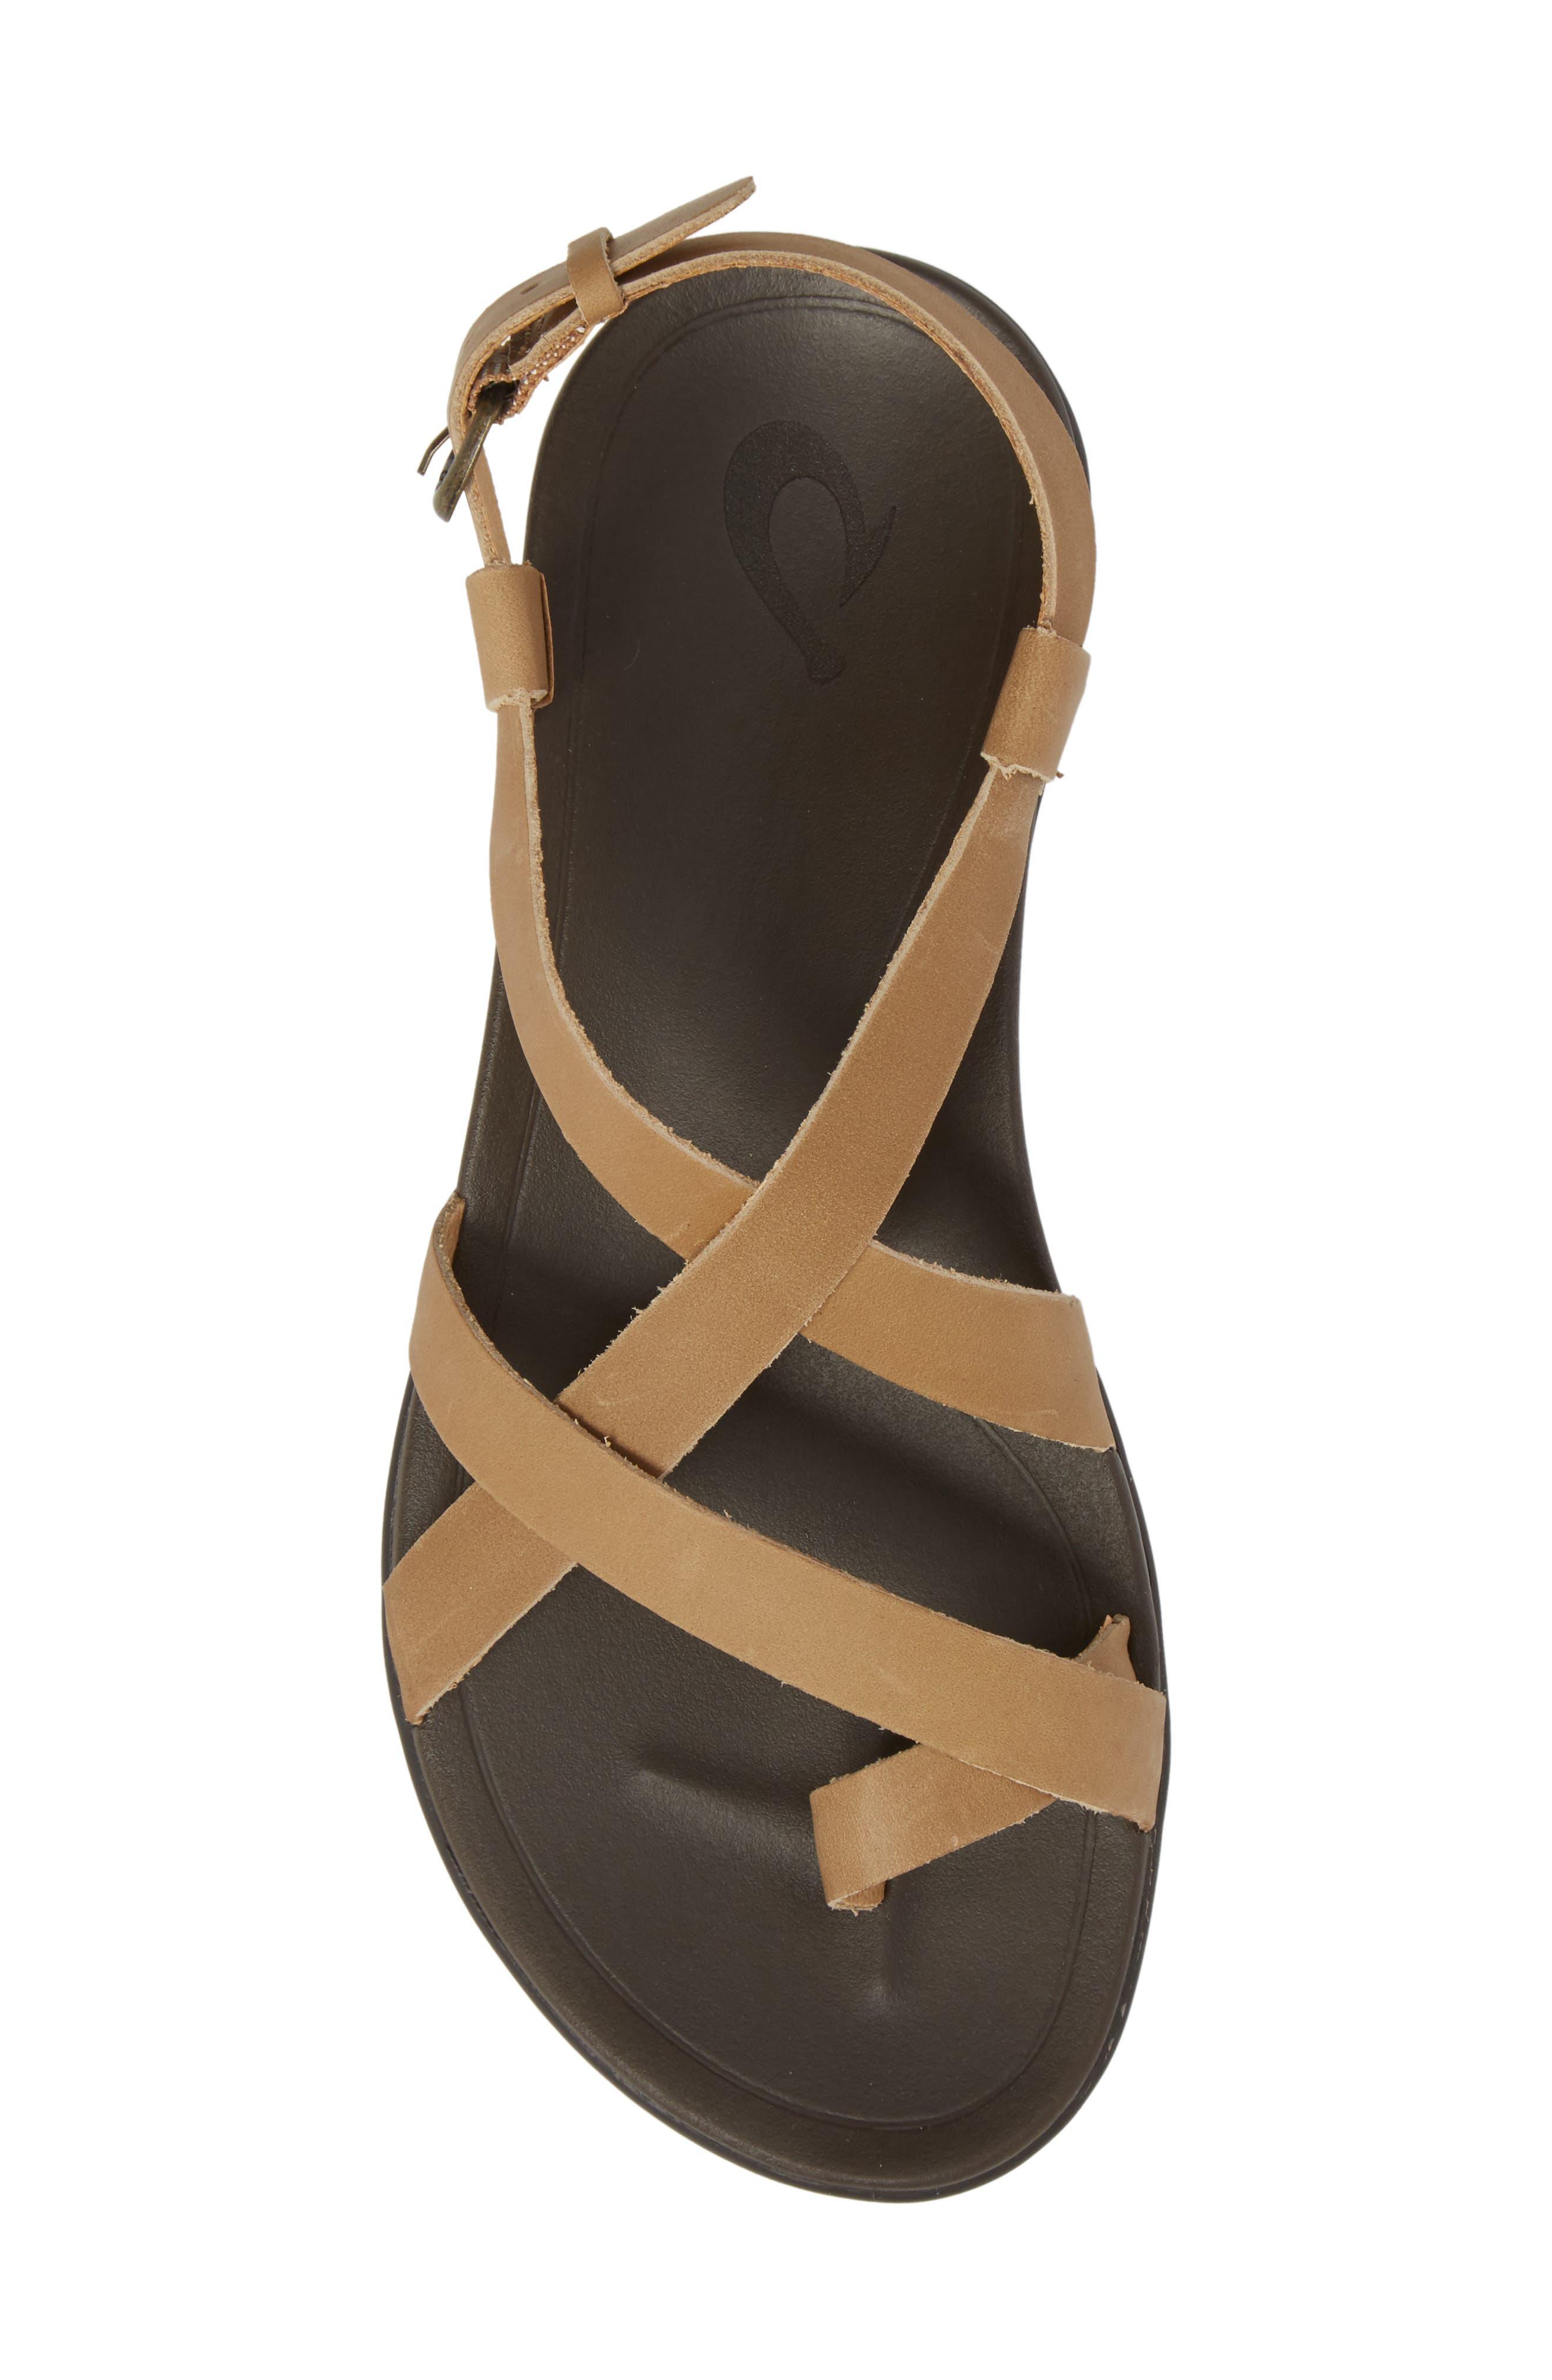 'Upena' Flat Sandal,                             Alternate thumbnail 5, color,                             GOLDEN SAND/ SAND LEATHER